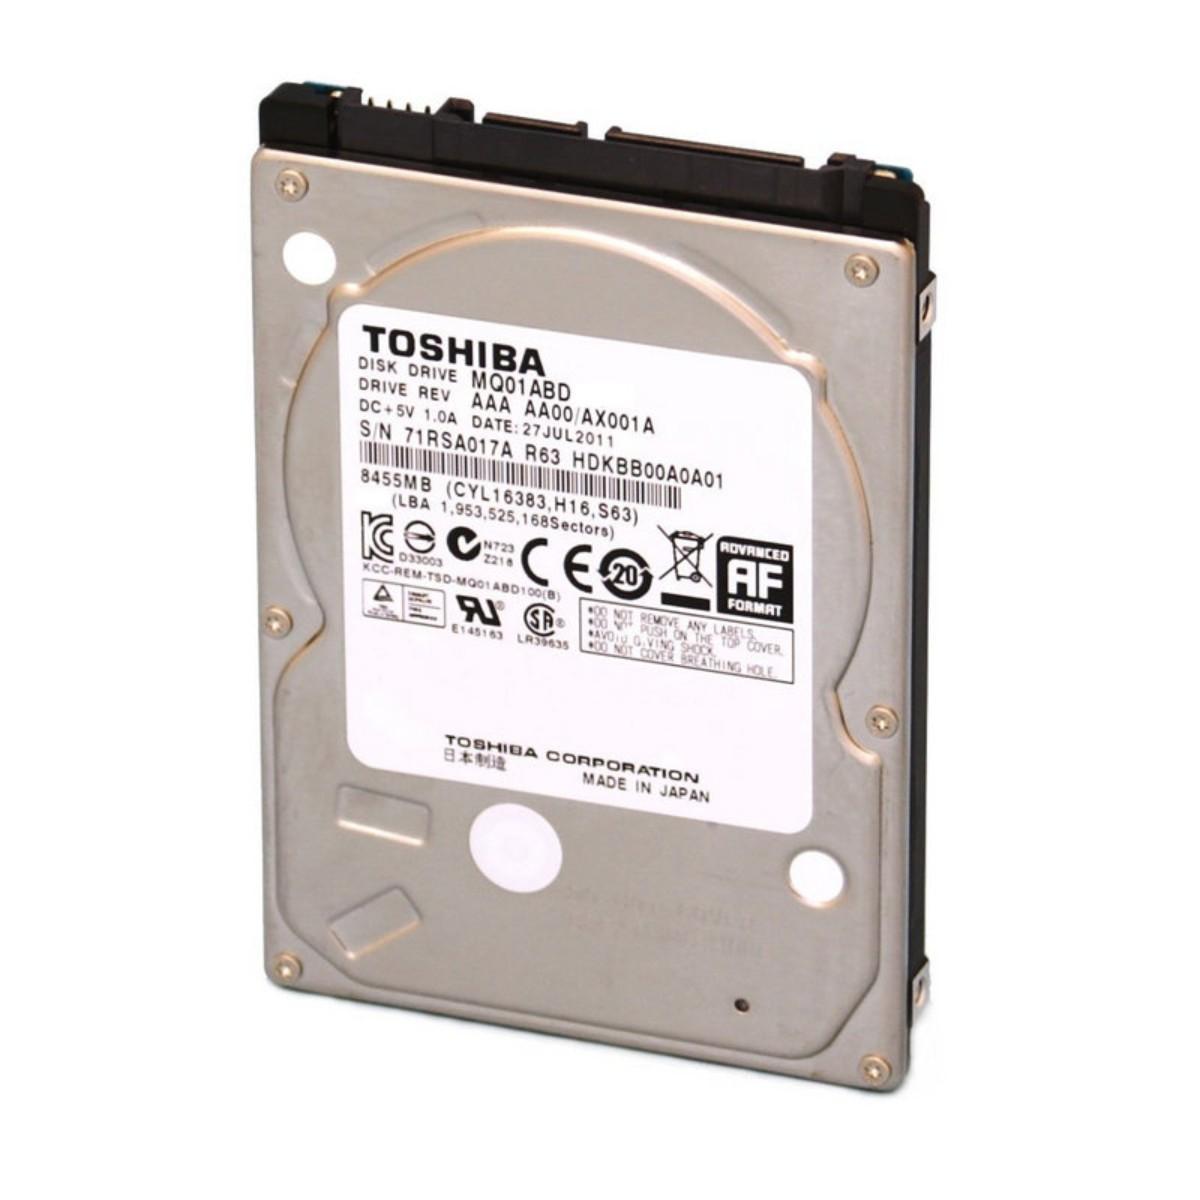 HD p/ Notebook 500Gb Sata 3.0Gb/s 5400rpm Toshiba MQ01ABD050V - Novo